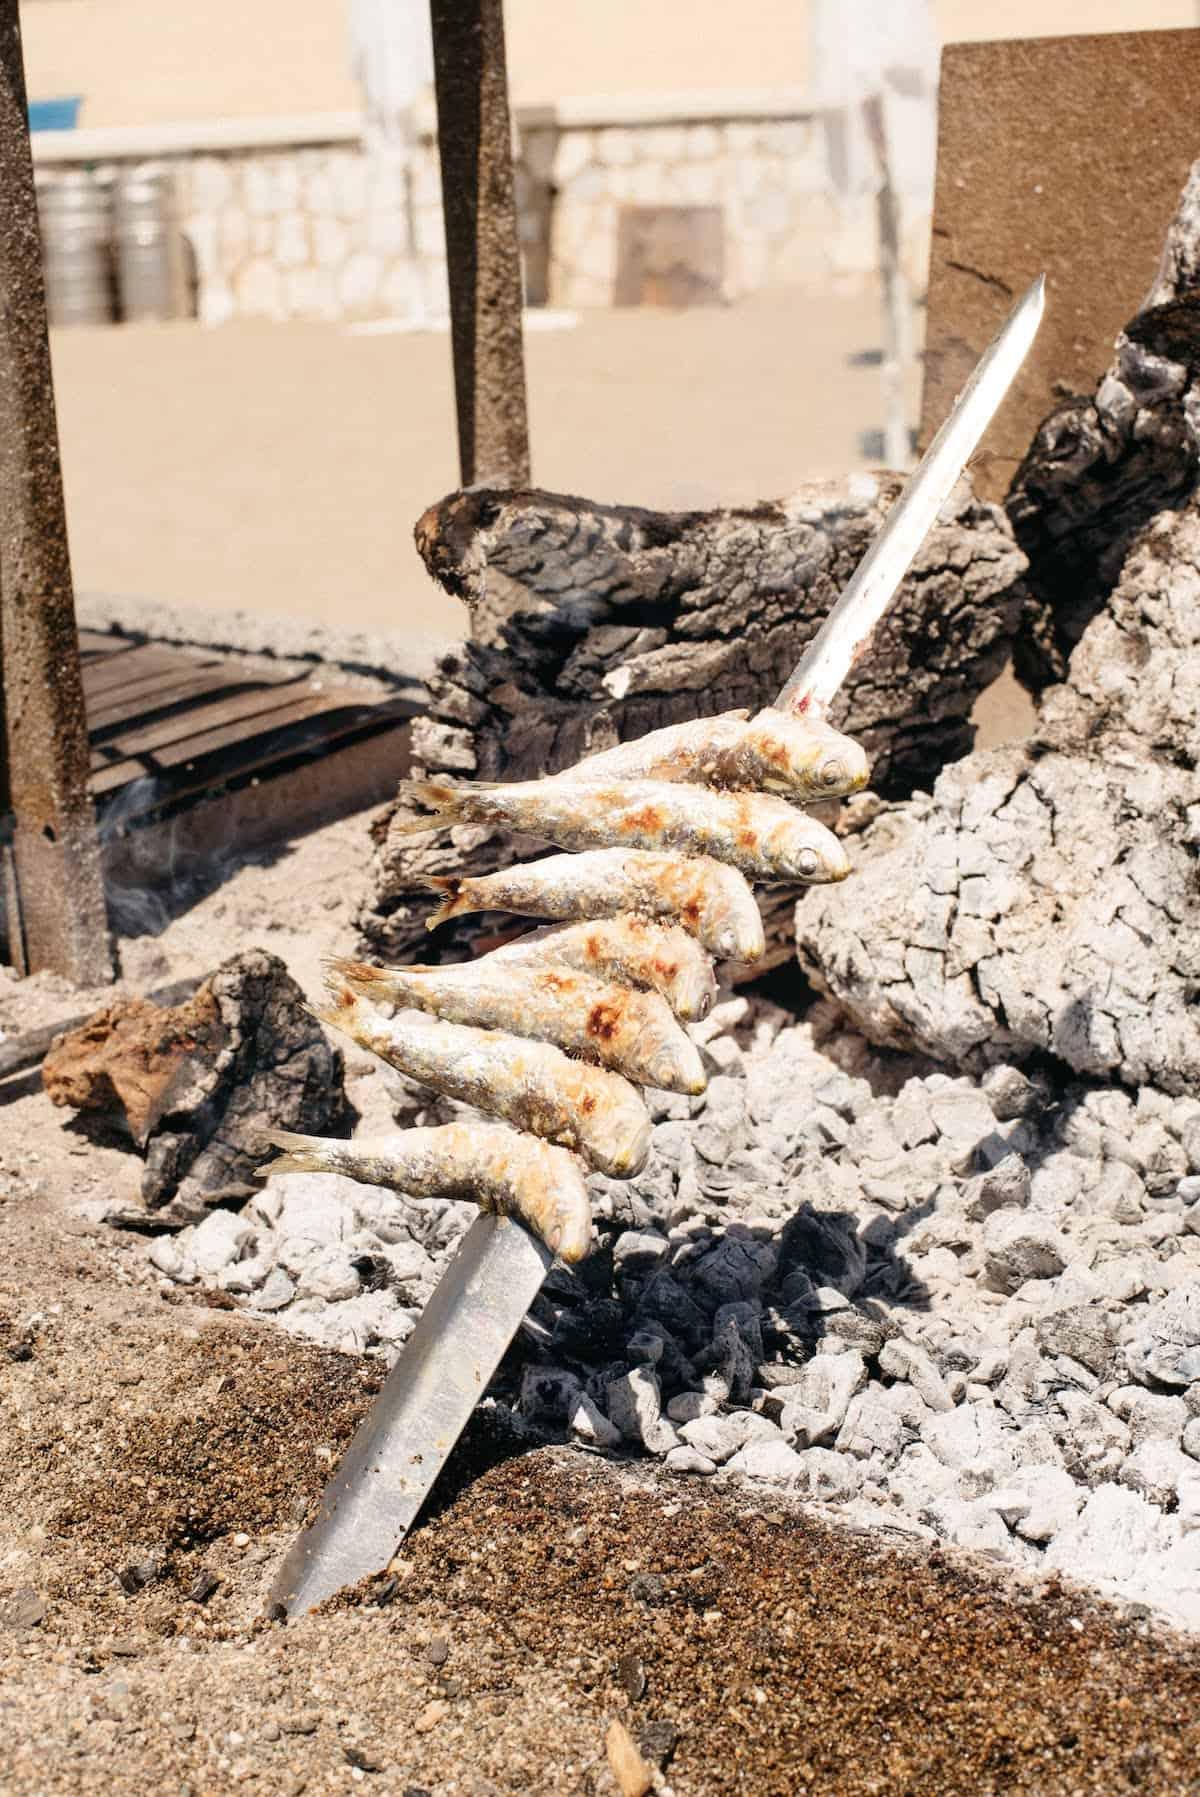 Skewer of sardines grilling over coals.